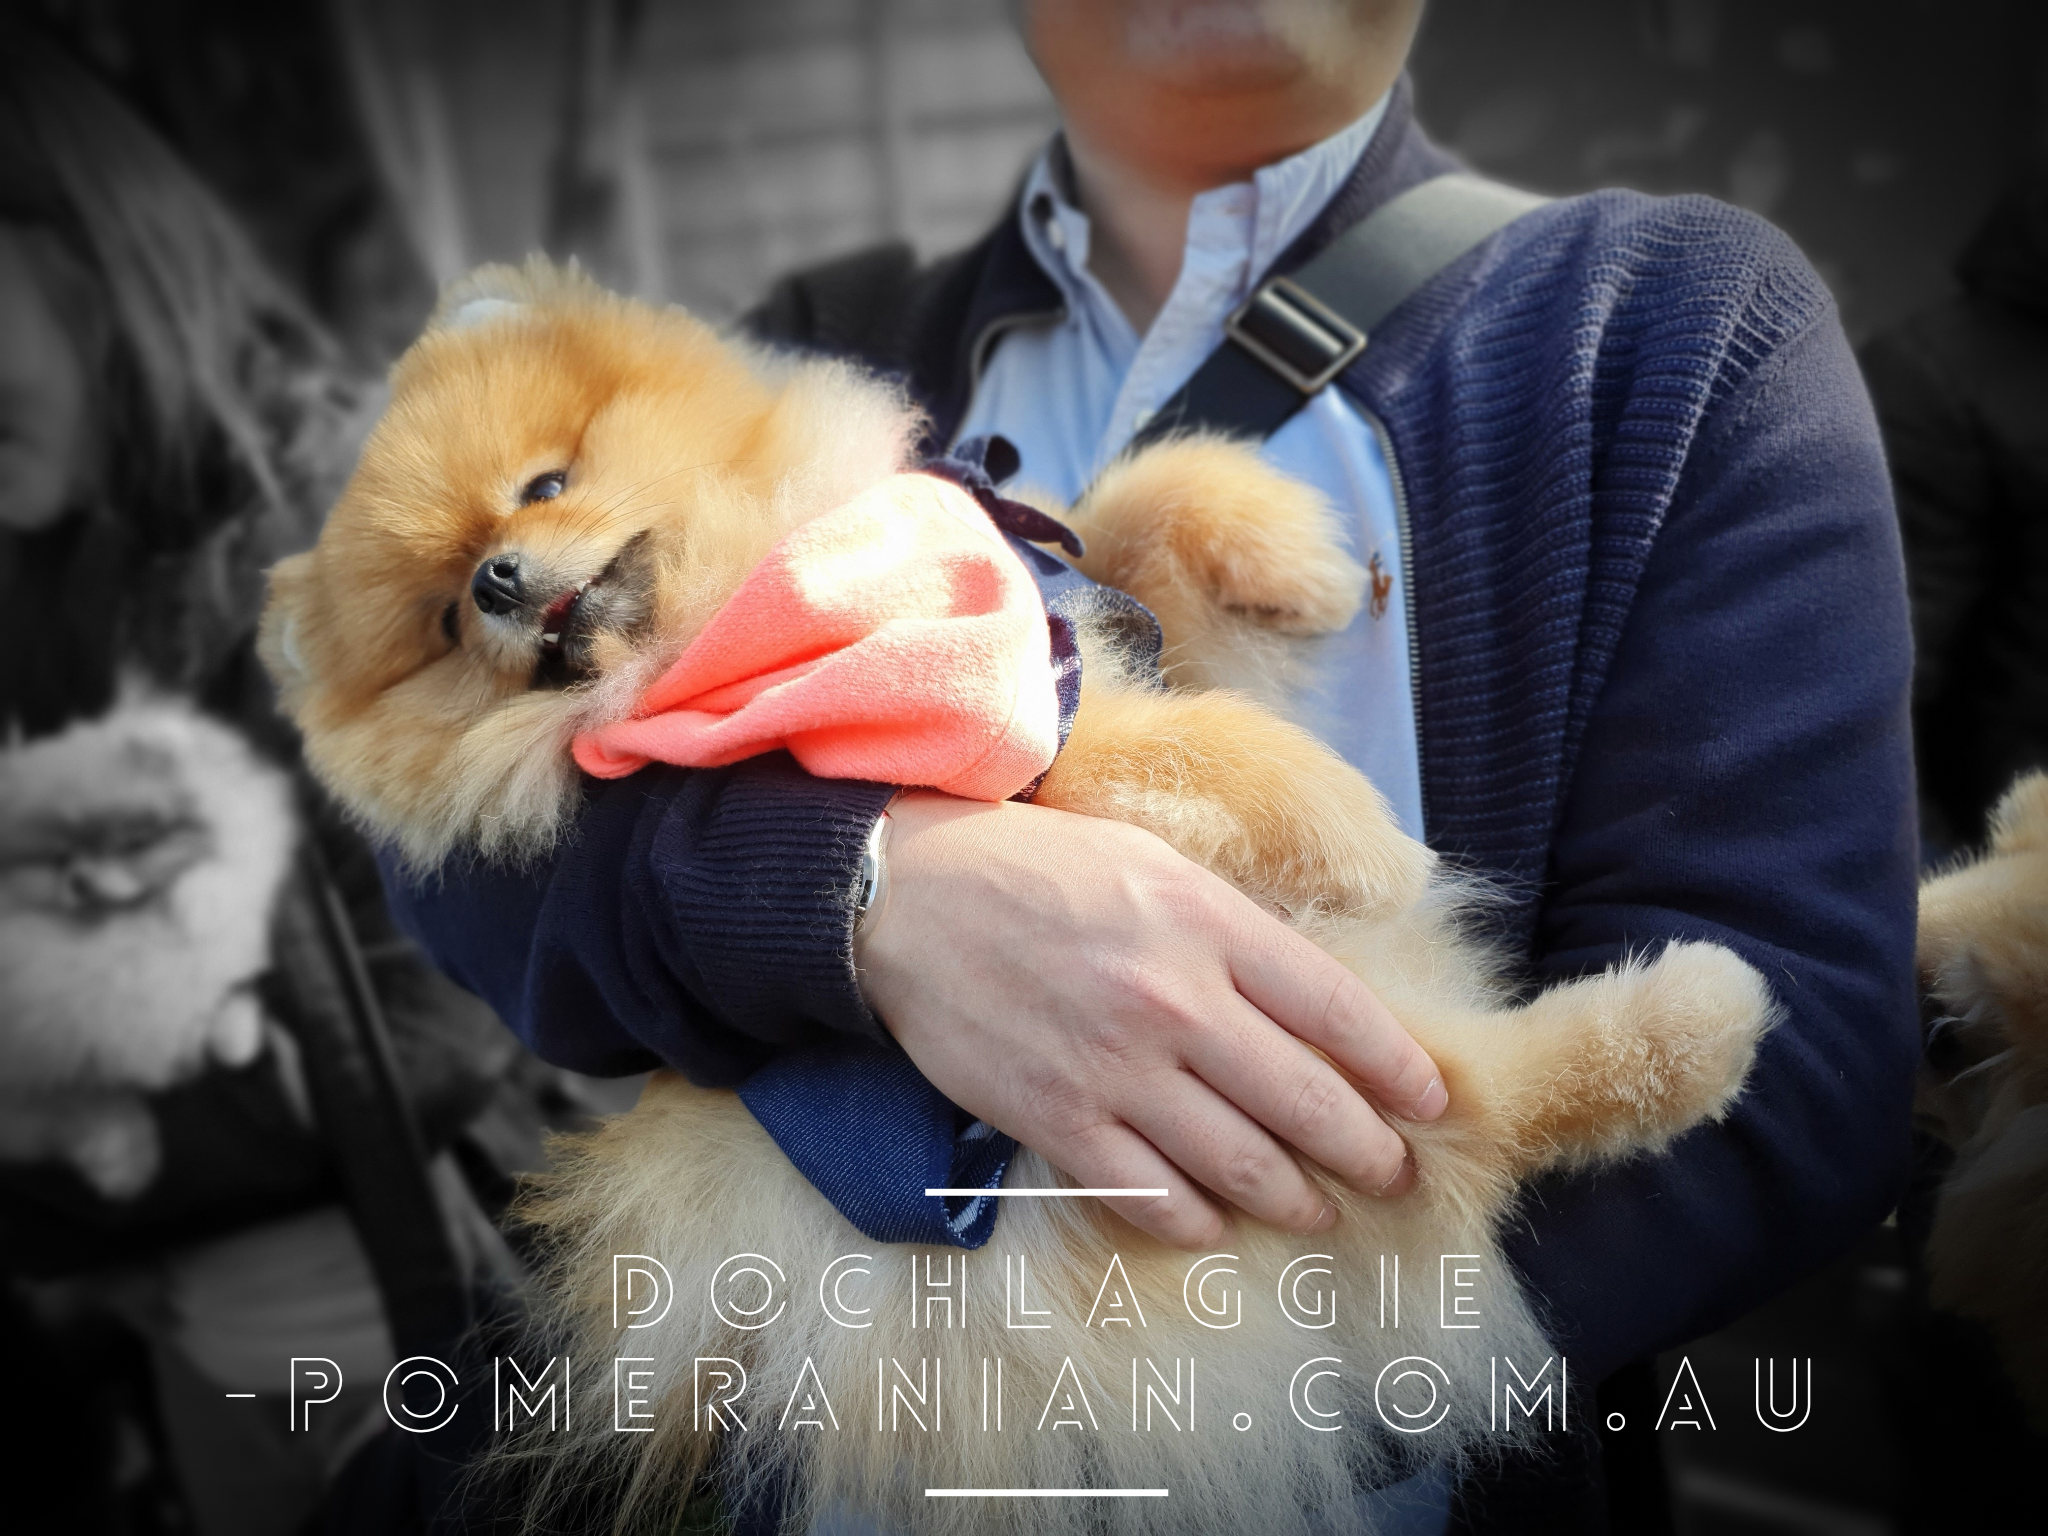 Dochlaggie Pomeranian Puppies Melbourne Dochlaggie Dochlaggiepomeranians Pomeranians Pomeranian Pomeraniandog Pomeranian Beautiful Dogs Pomeranian Puppy